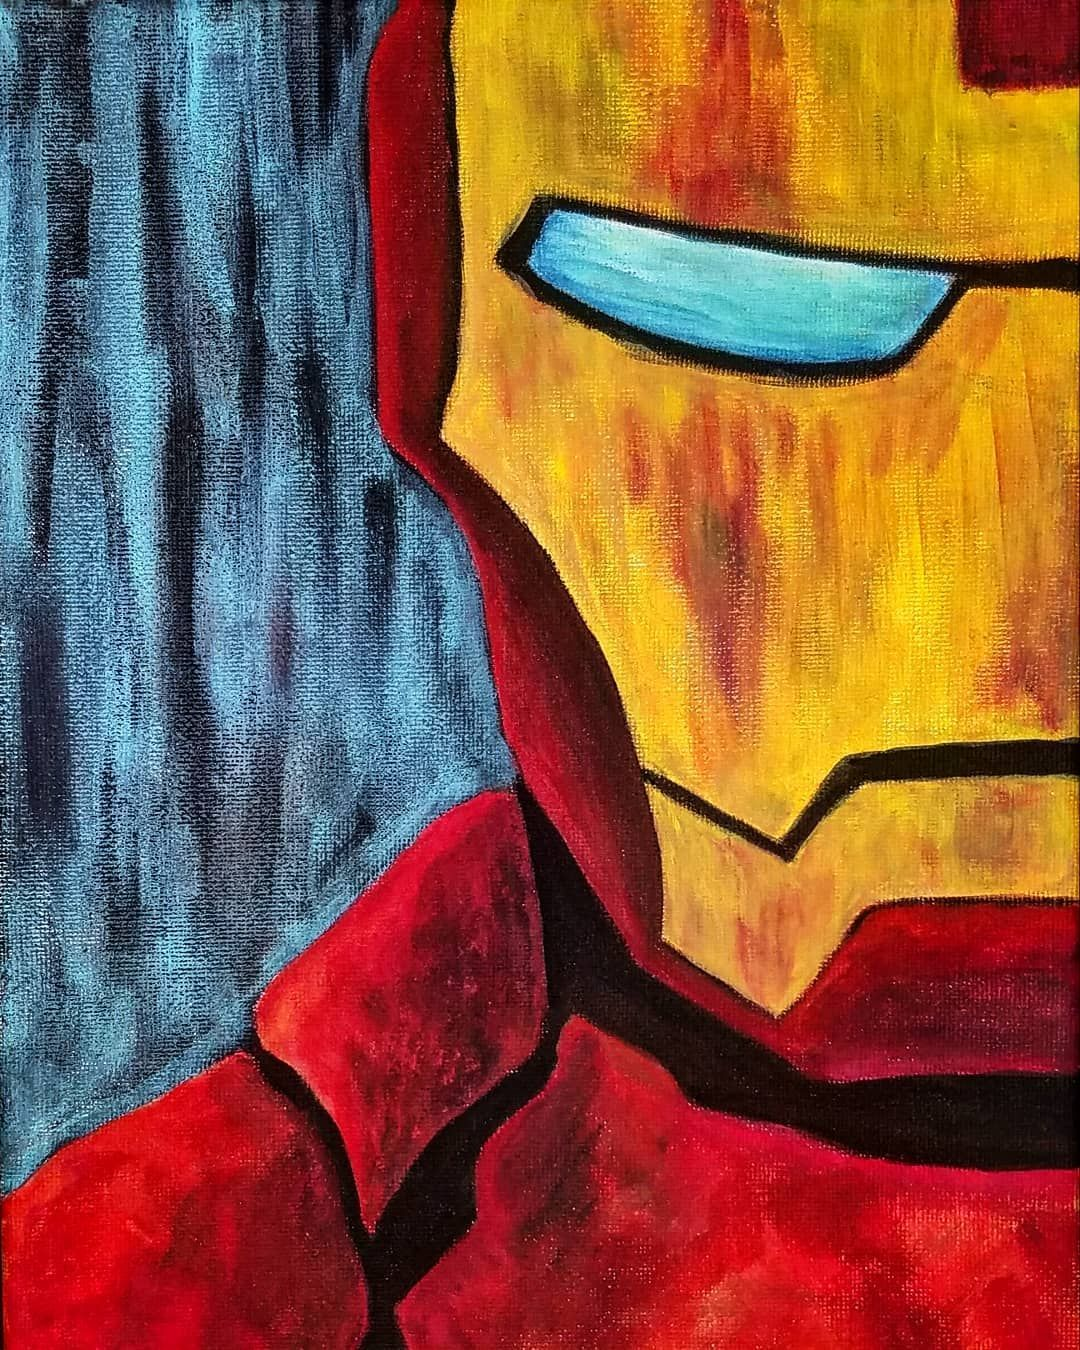 Iron Man Painting By Cam Harpold Cam Harpold Iron Man Painting Iron Man Painting Marvel Paintings Iron Man Art Paint